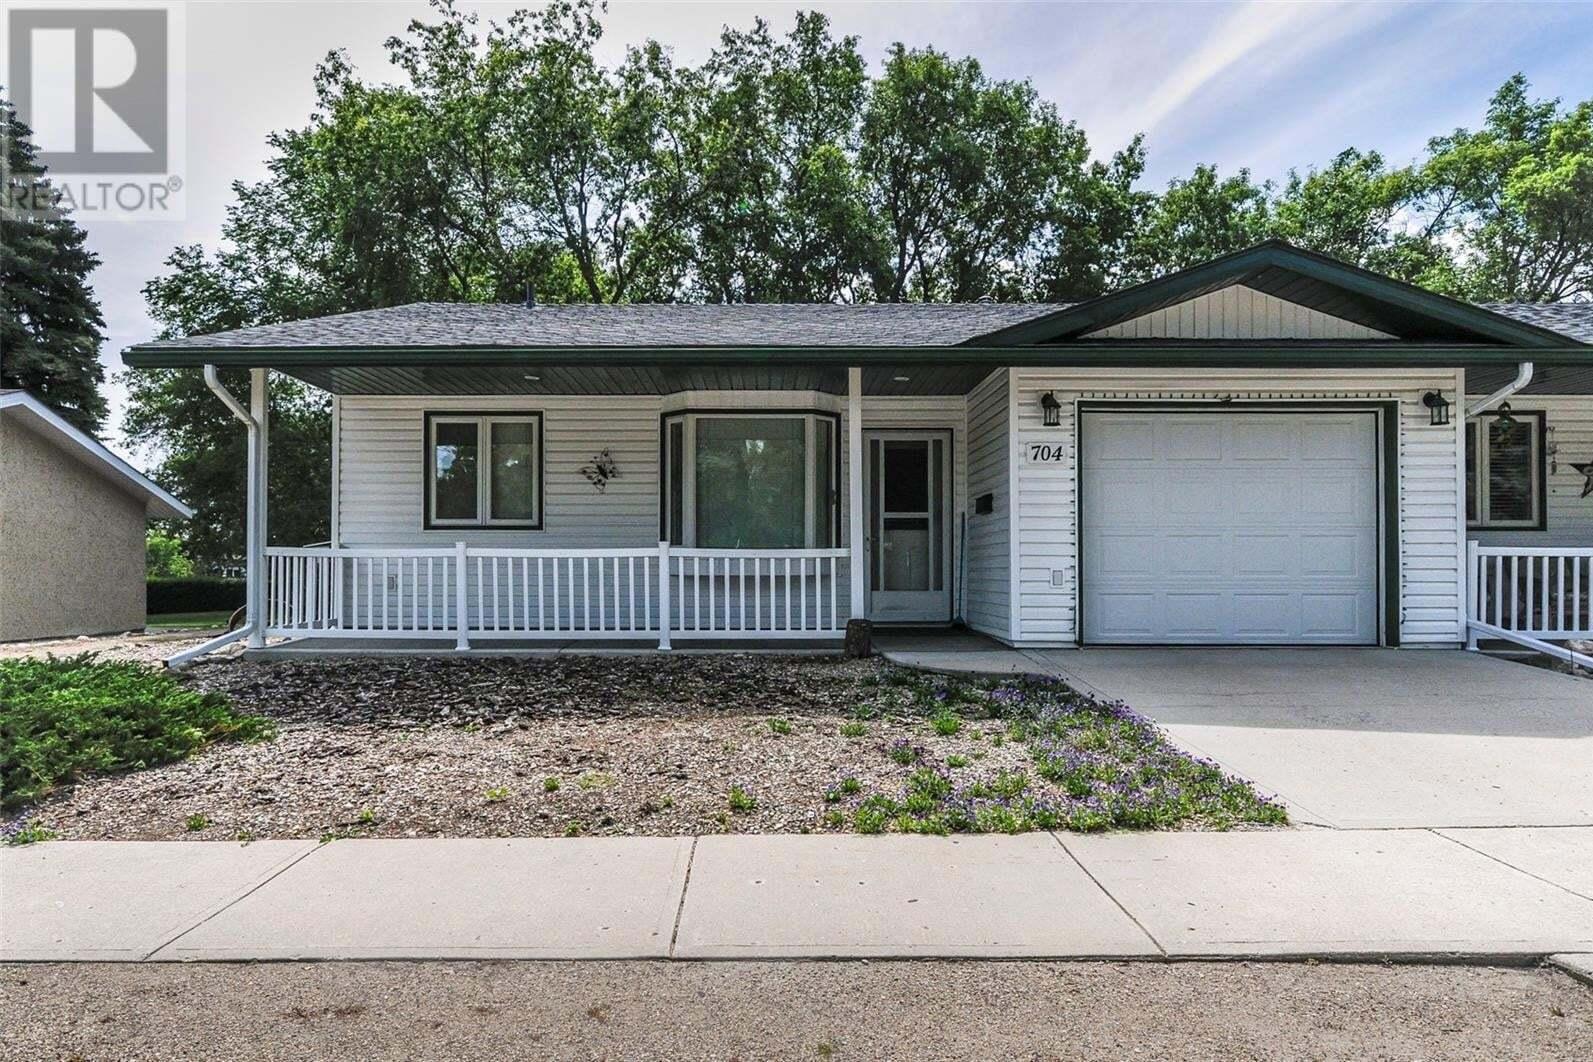 Townhouse for sale at 704 Eden St Indian Head Saskatchewan - MLS: SK817702